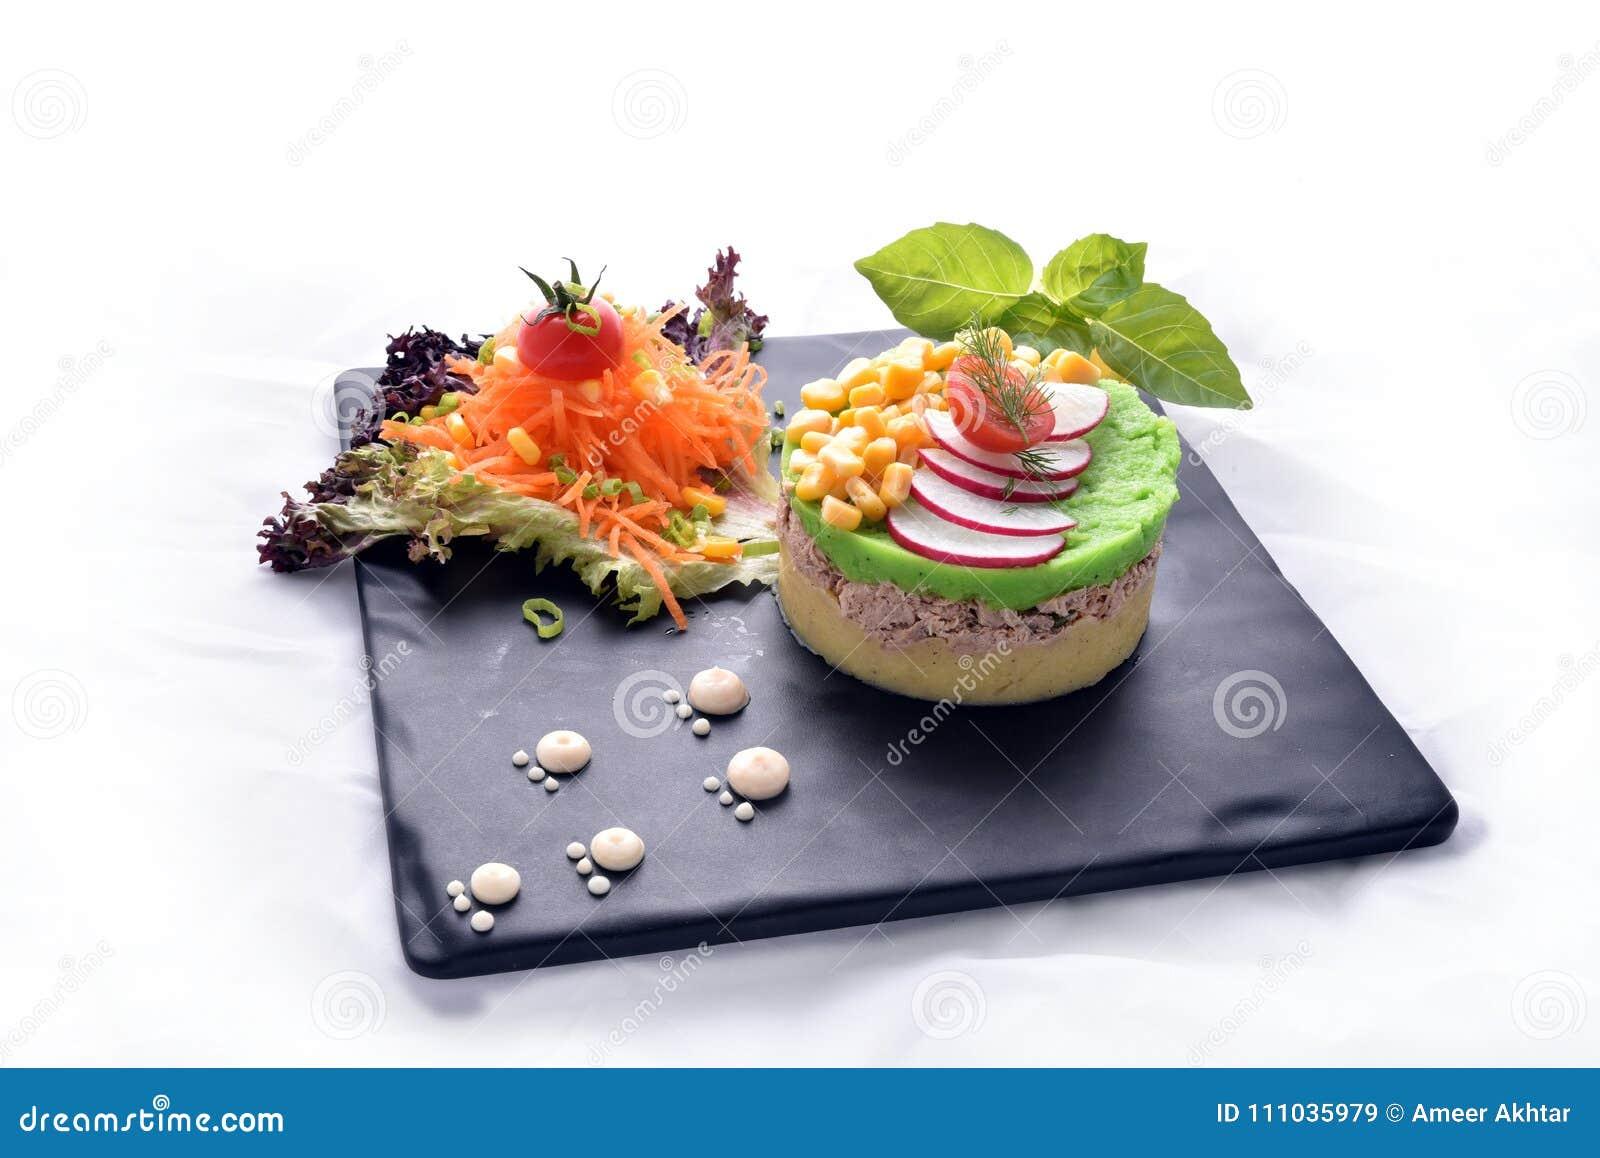 Tuna Fish With Mashed Potatoes & Salads- Healthy Meal Stock